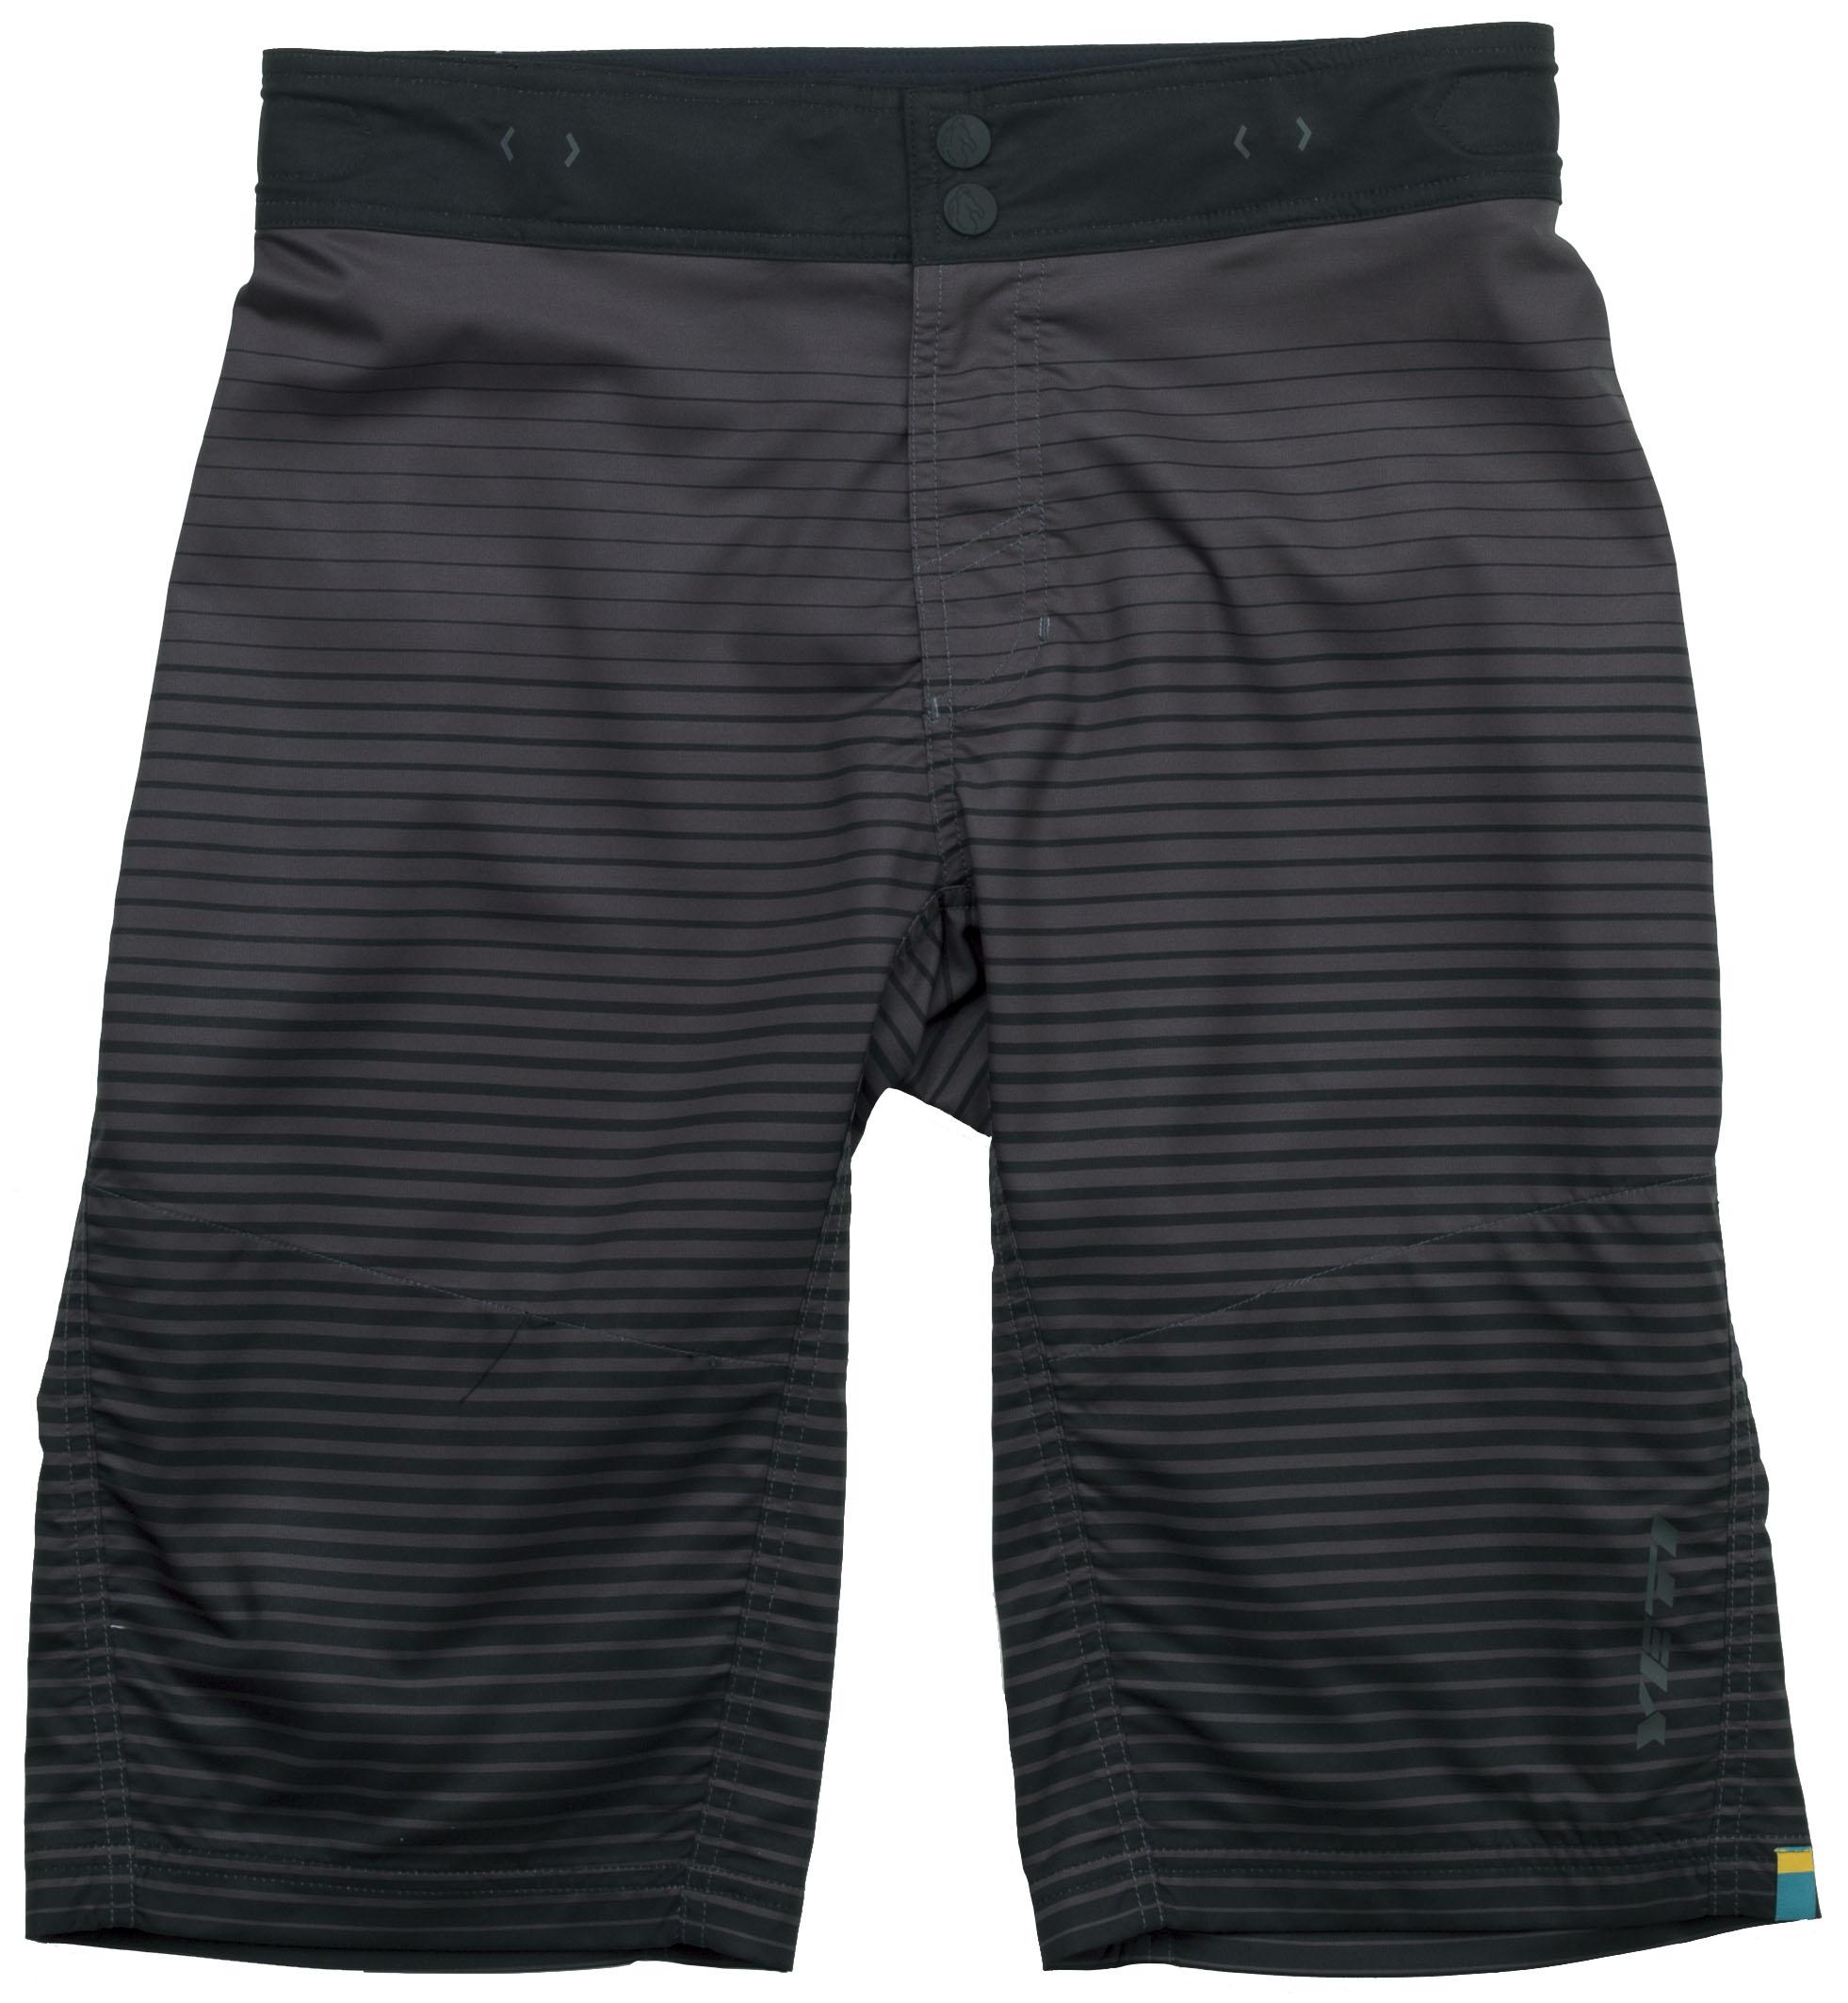 Yeti Teller Shorts 2018